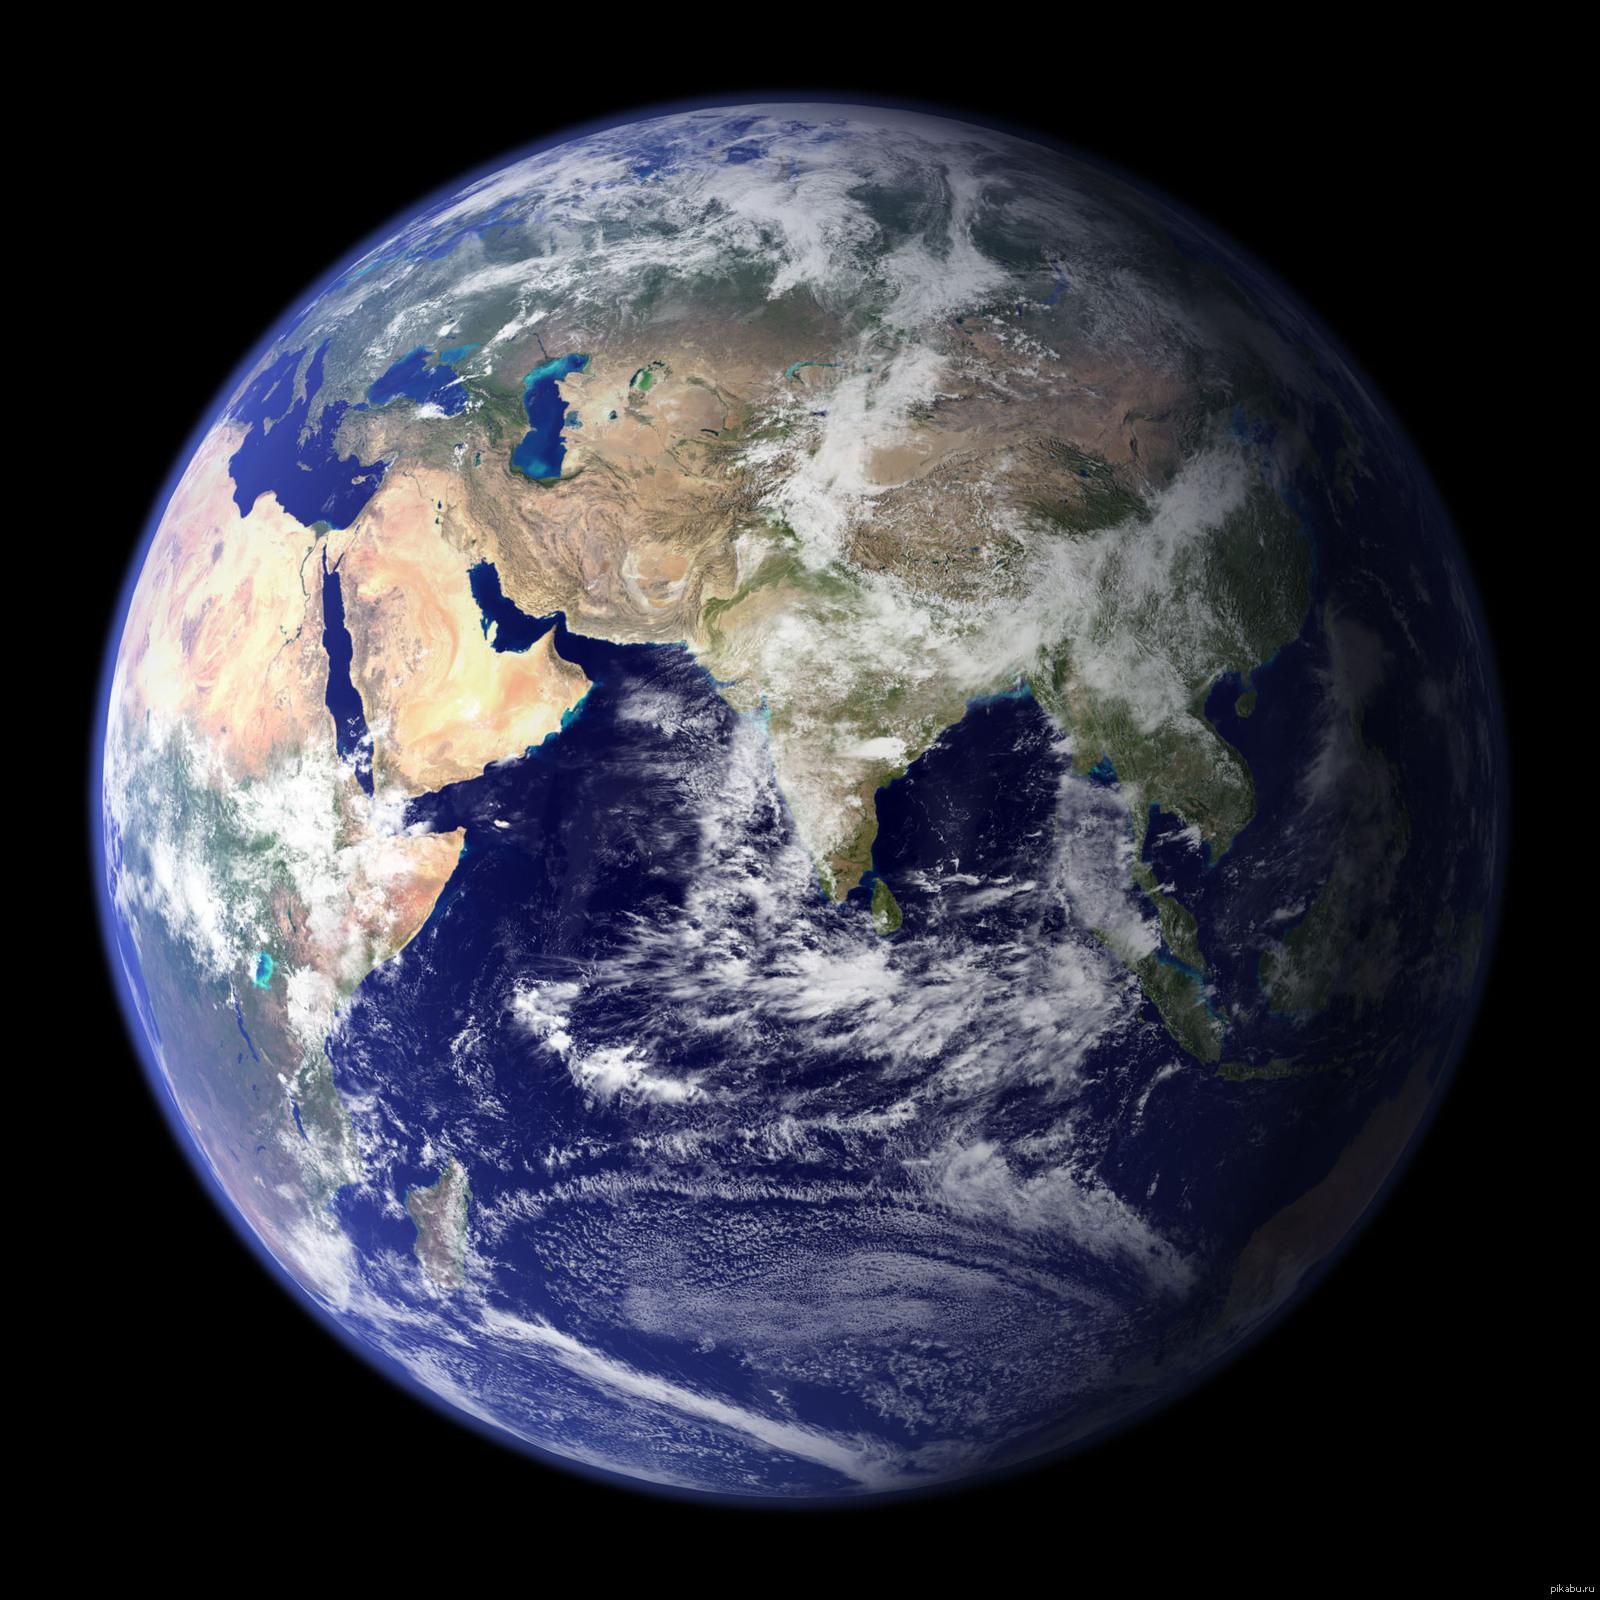 planets surrounding earth - HD